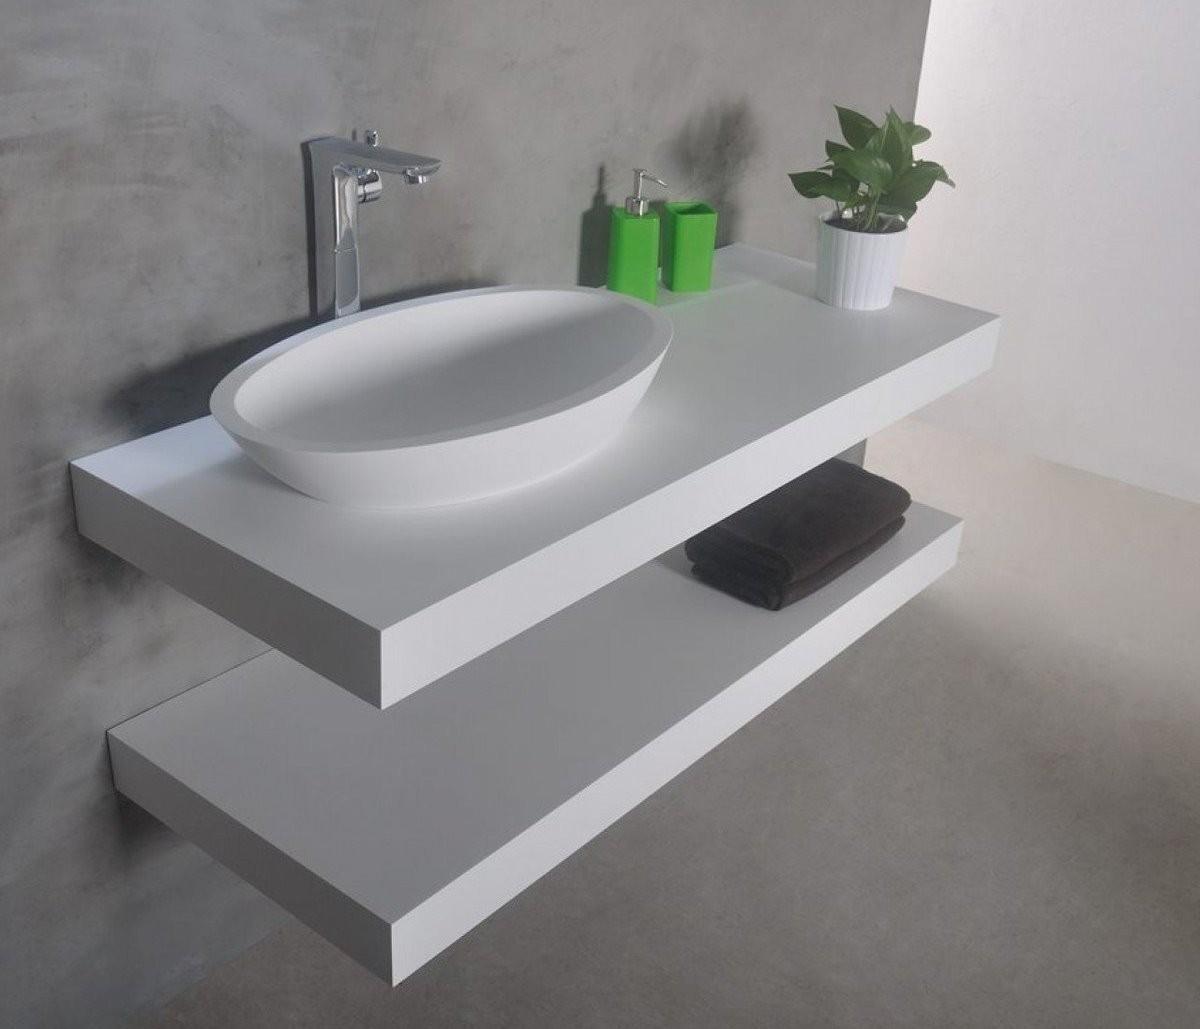 Ideavit Solidplus Hylde Til Handvask 90 X 46 Cm Solid Surface Mat Hvid